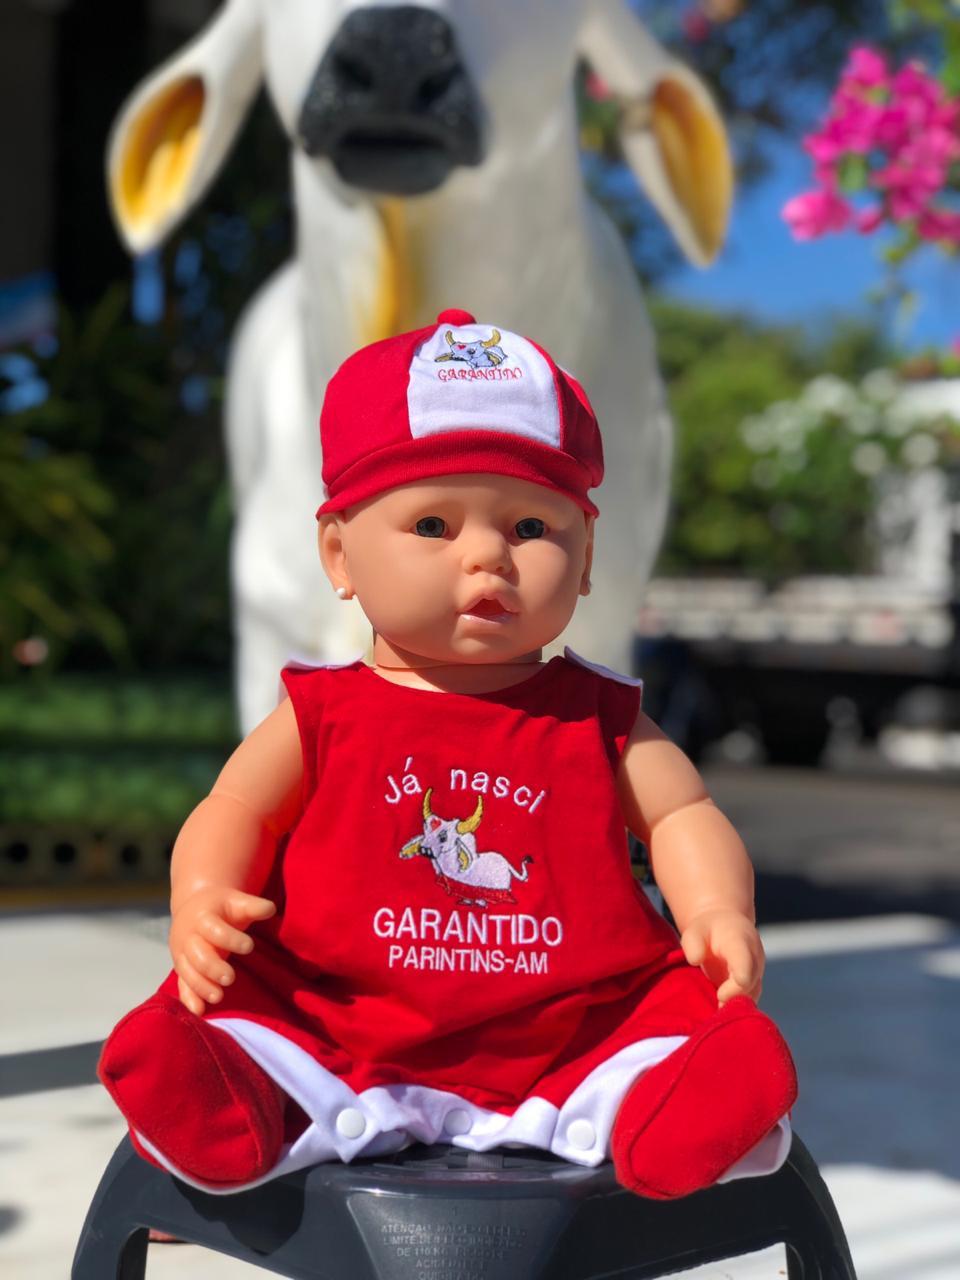 Body Baby Garantido - Q BOI Produtos do Festival de Parintins